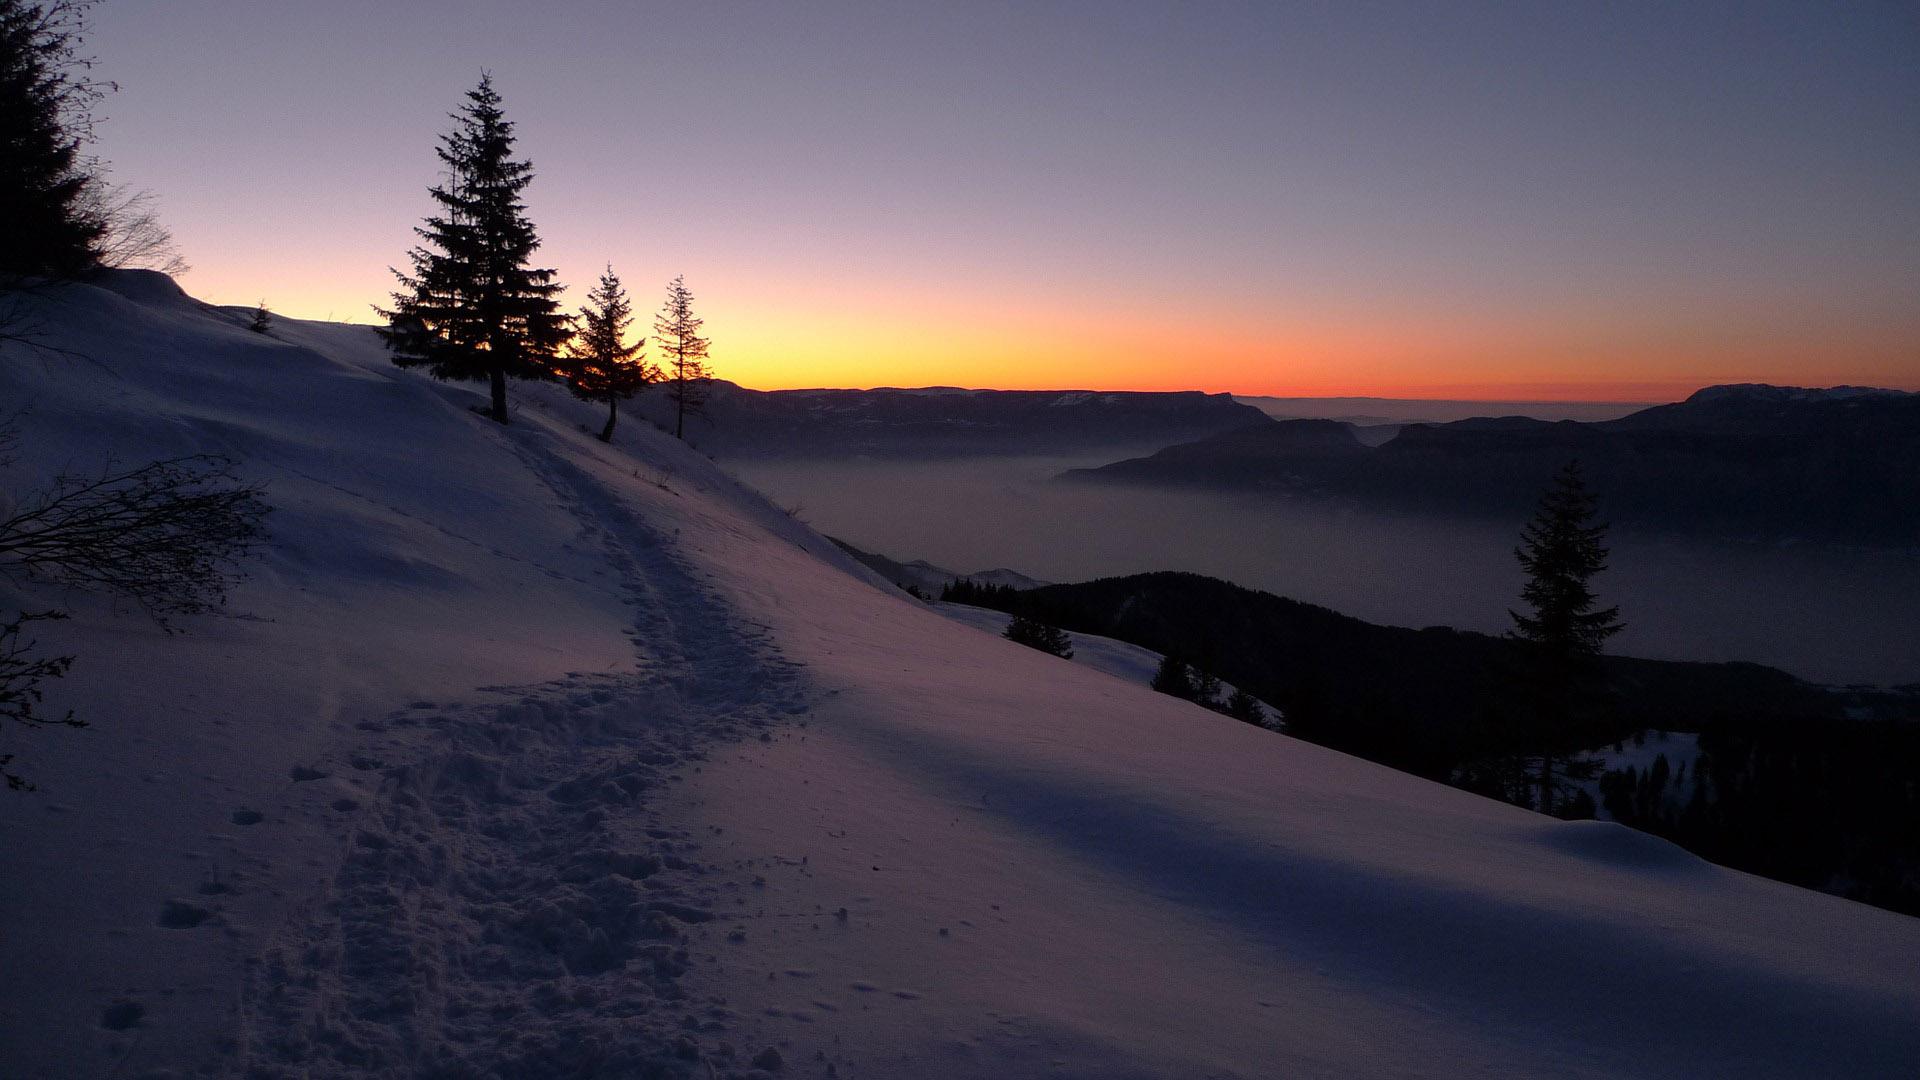 winter solstice - photo #18